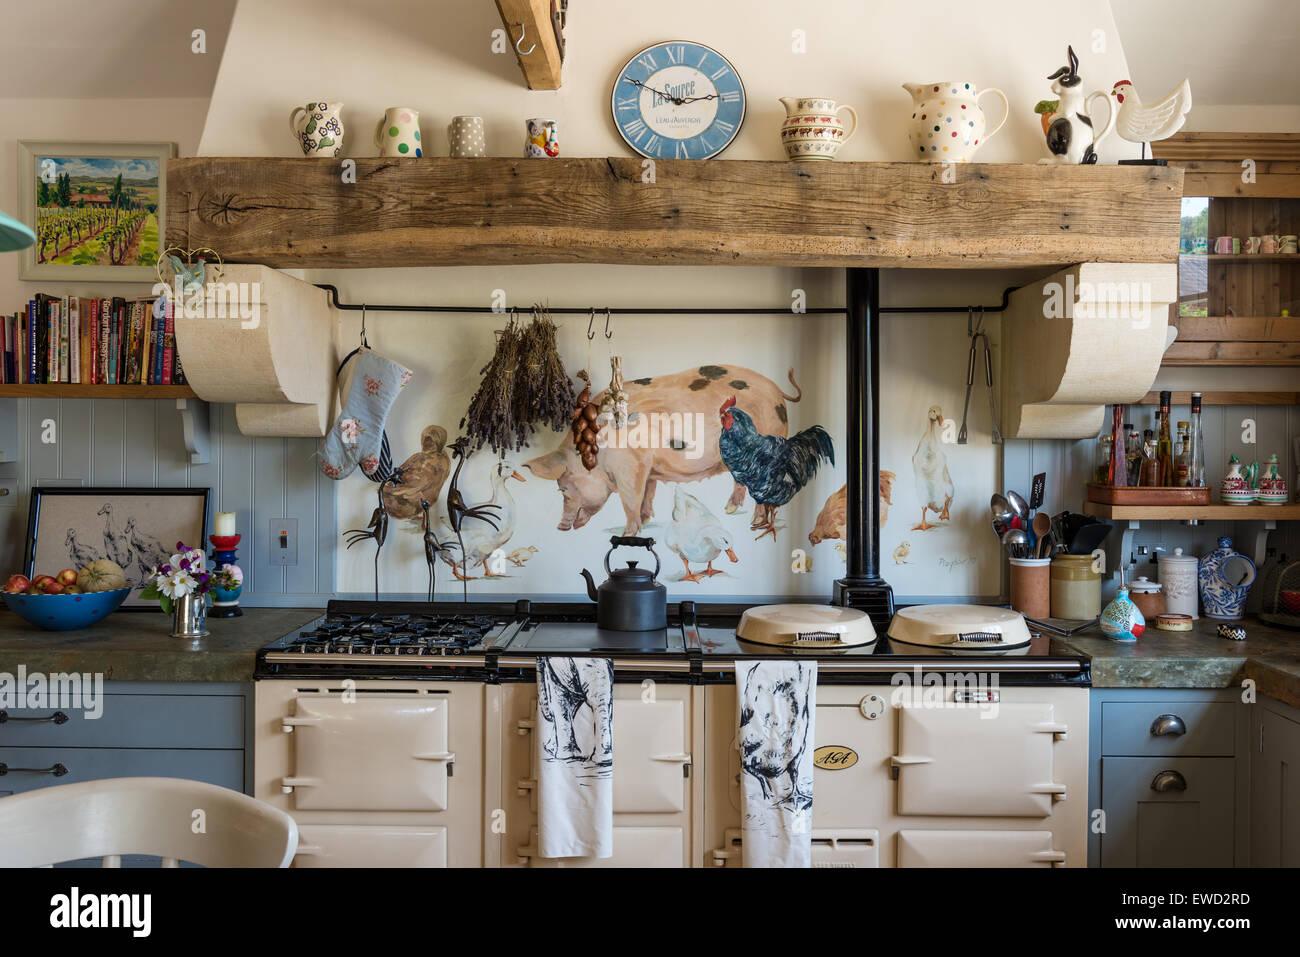 painted pig stockfotos painted pig bilder alamy. Black Bedroom Furniture Sets. Home Design Ideas